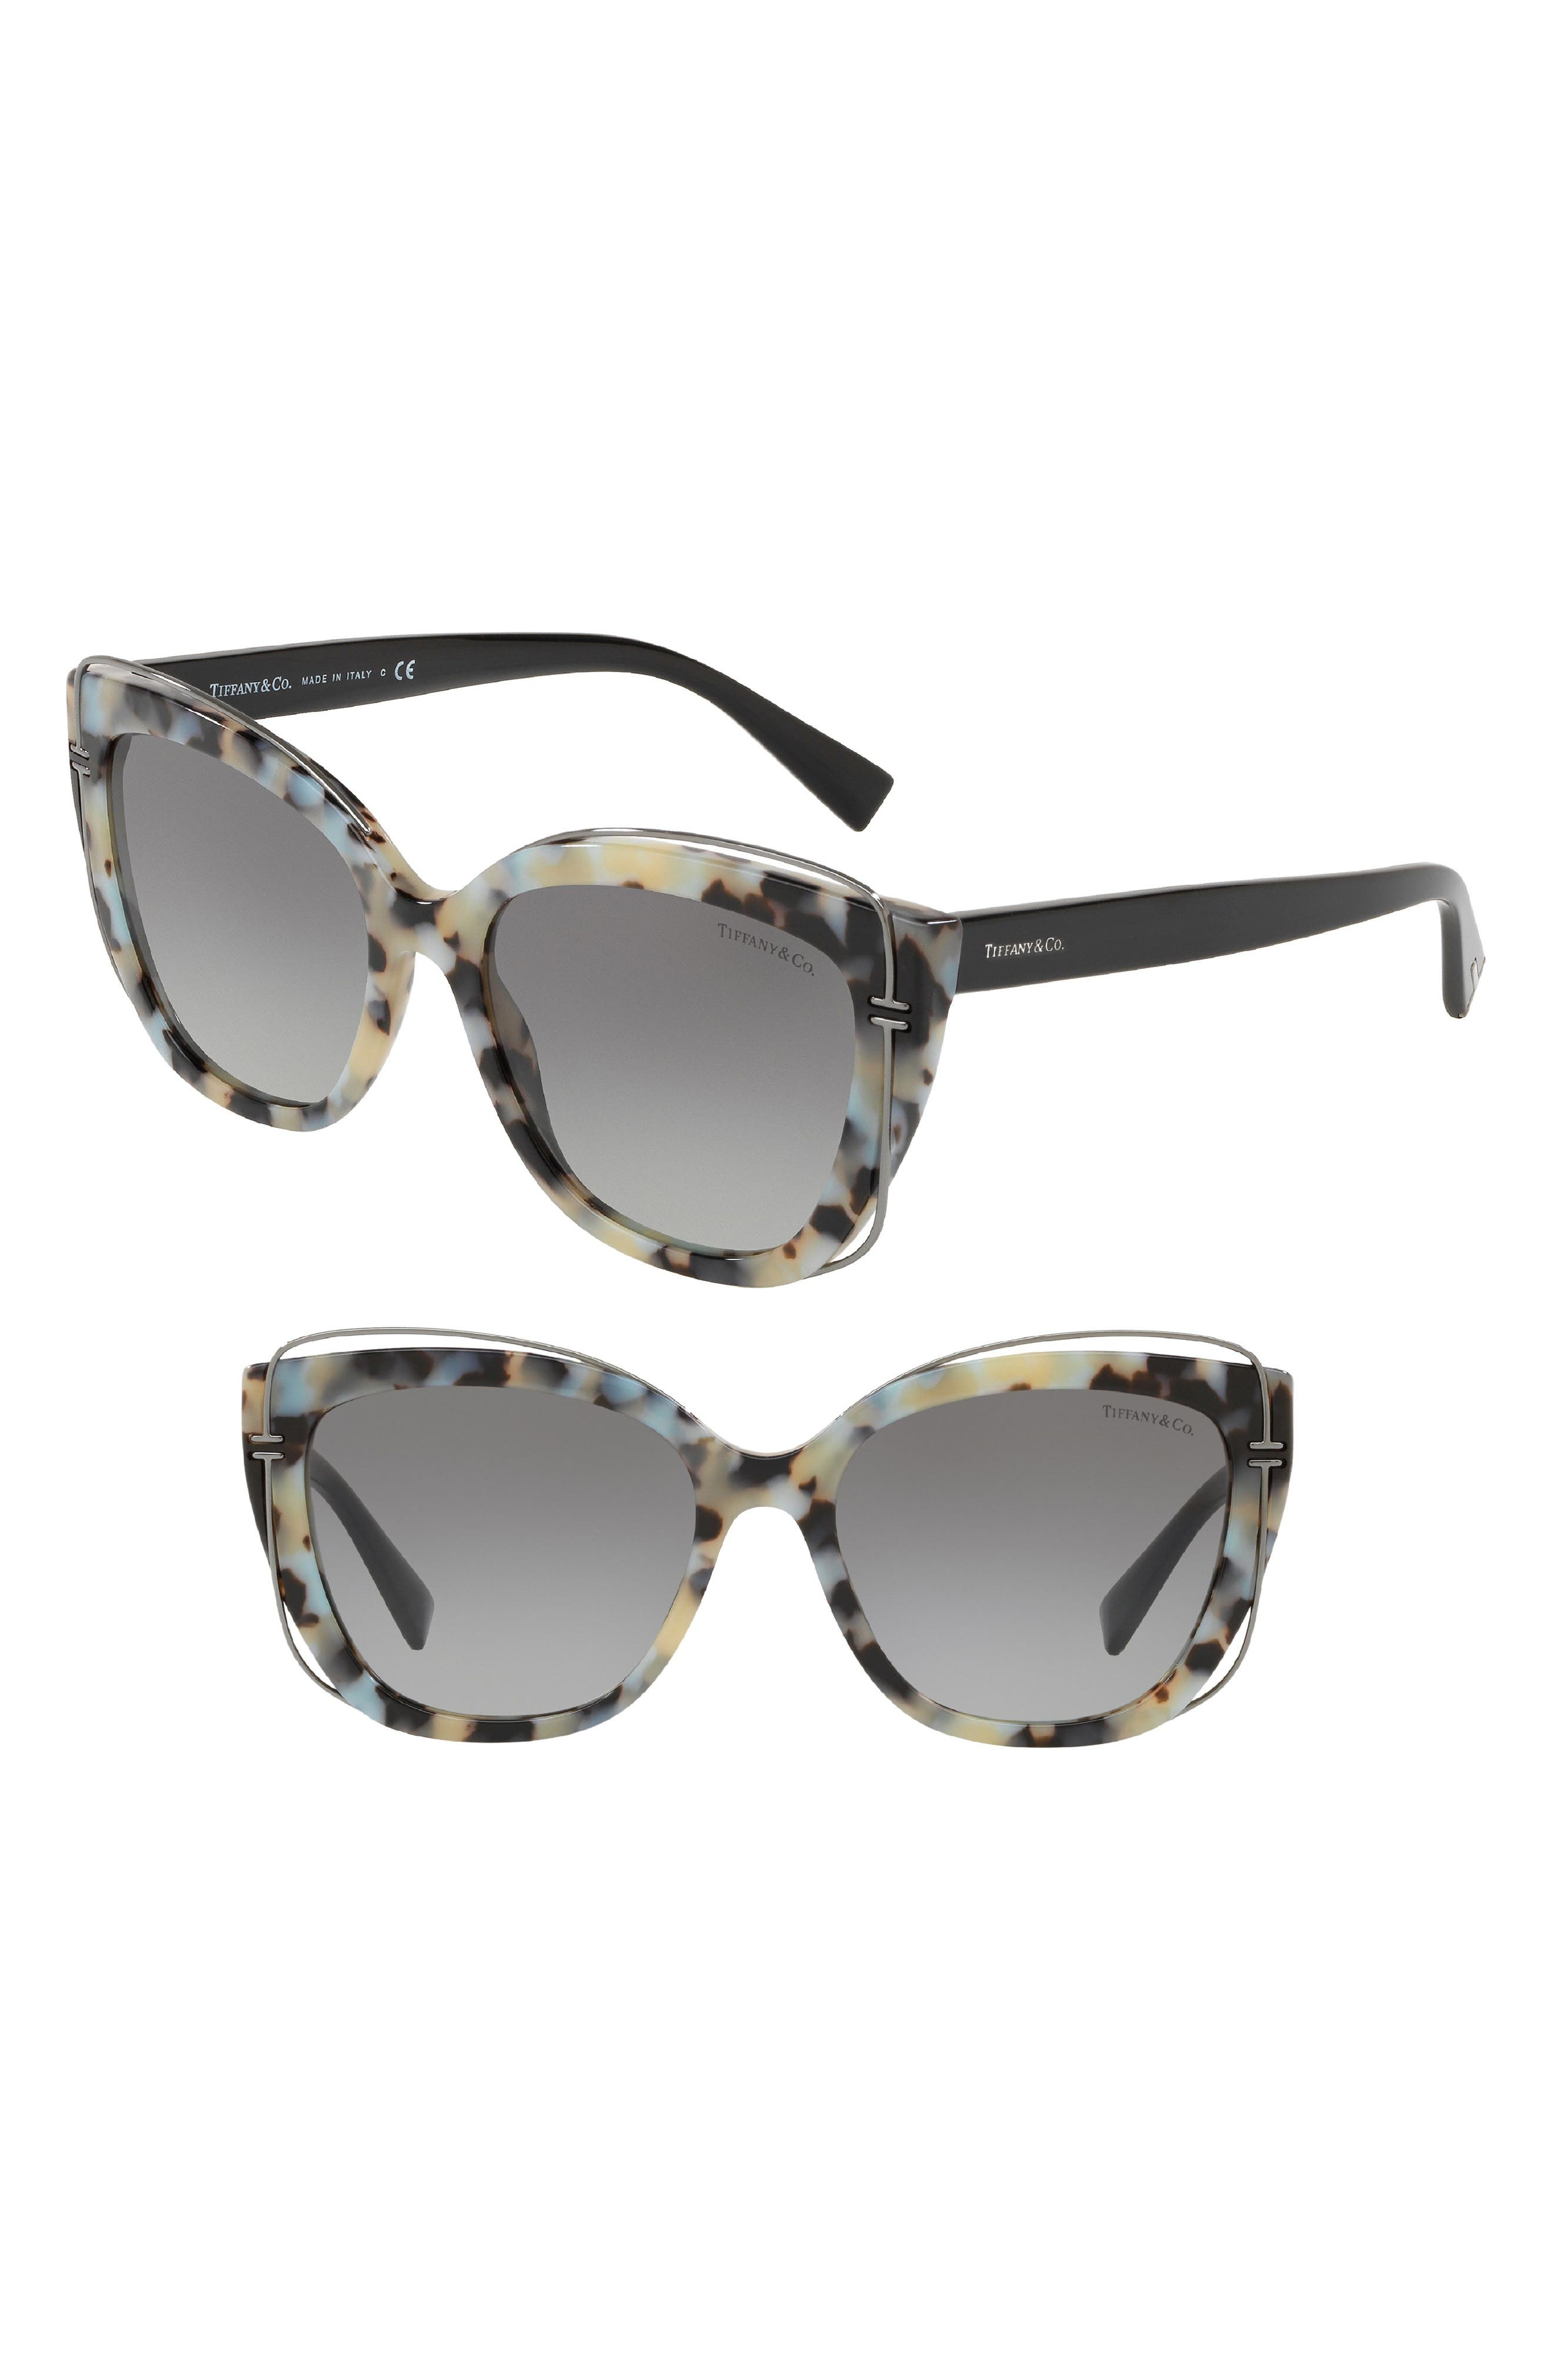 54mm Gradient Cat Eye Sunglasses,                             Main thumbnail 1, color,                             Beige Havana Gradient